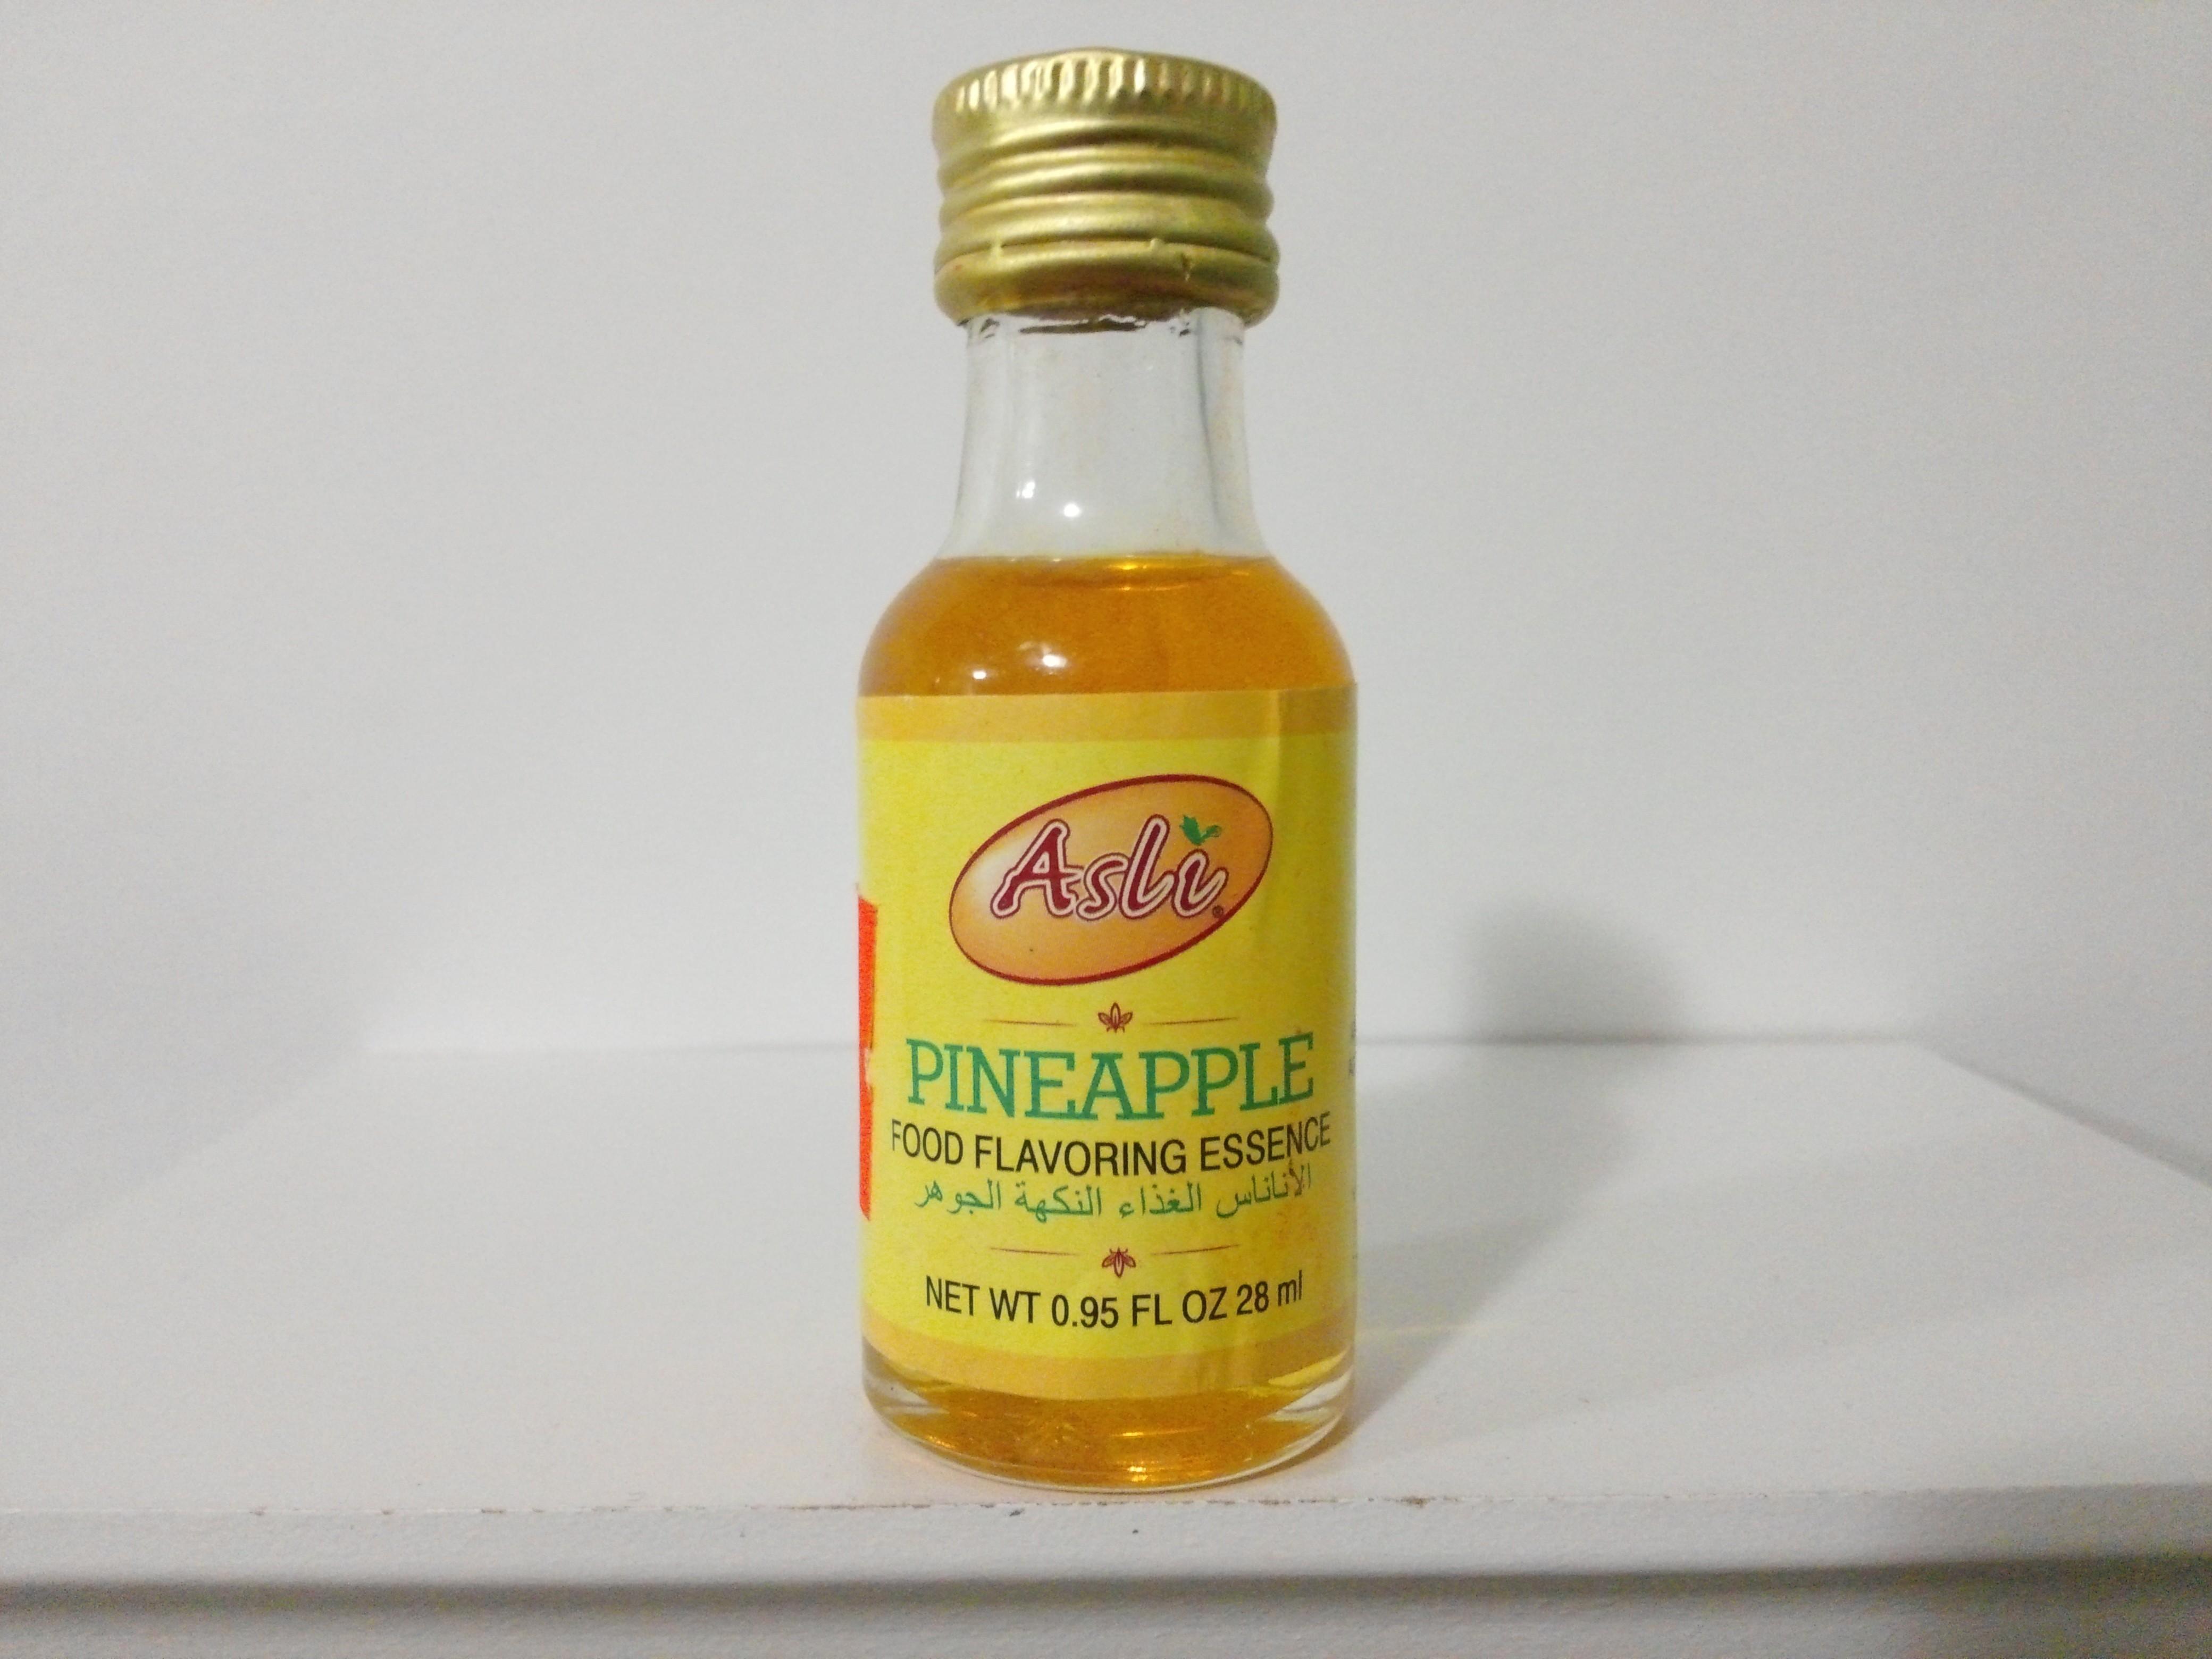 Pineapple Food Flavoring Essence 20 ml